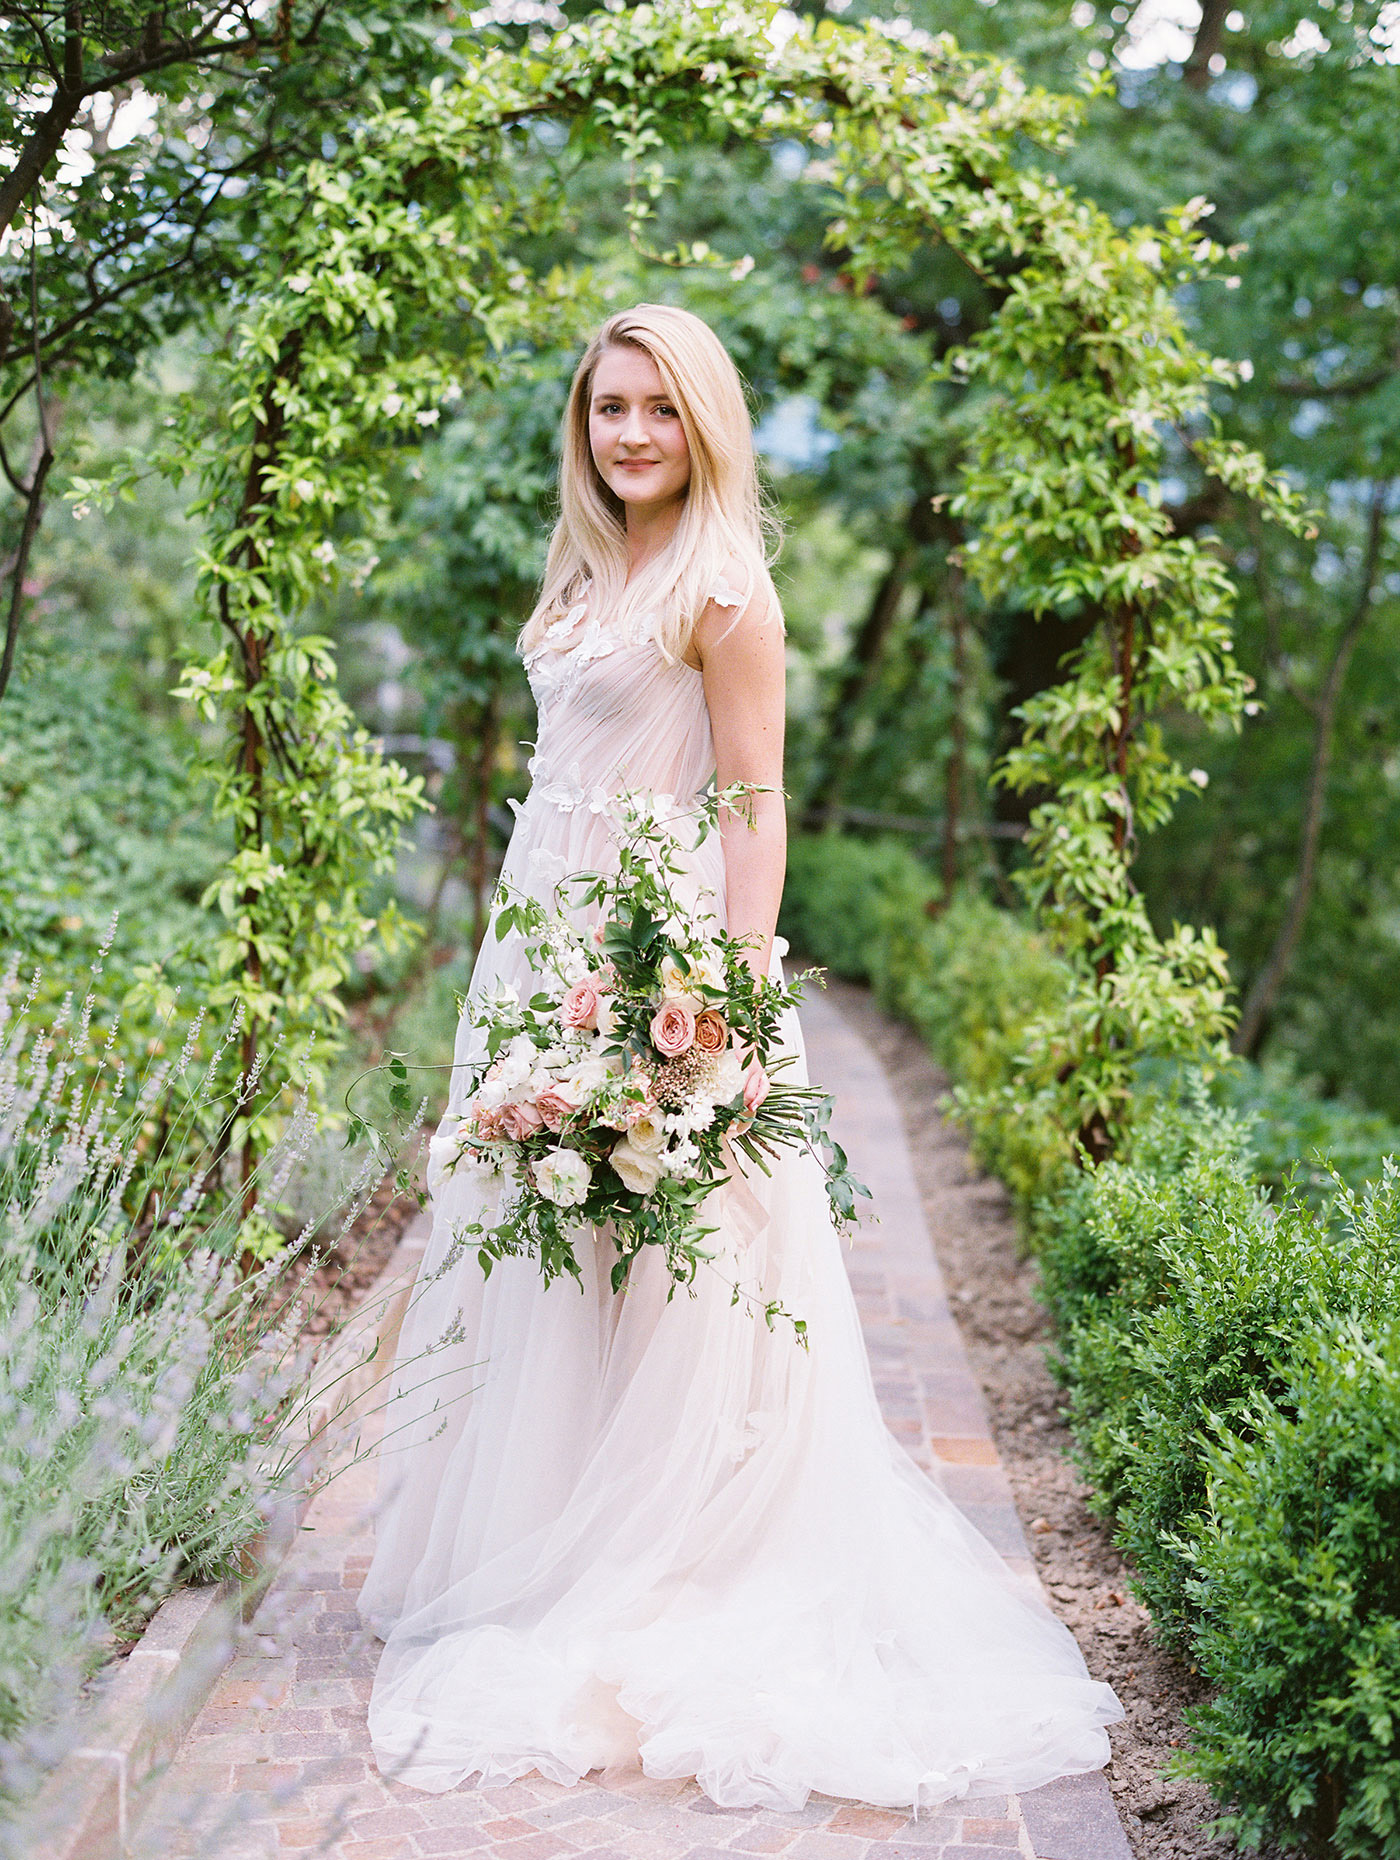 julia franz wedding bride dress